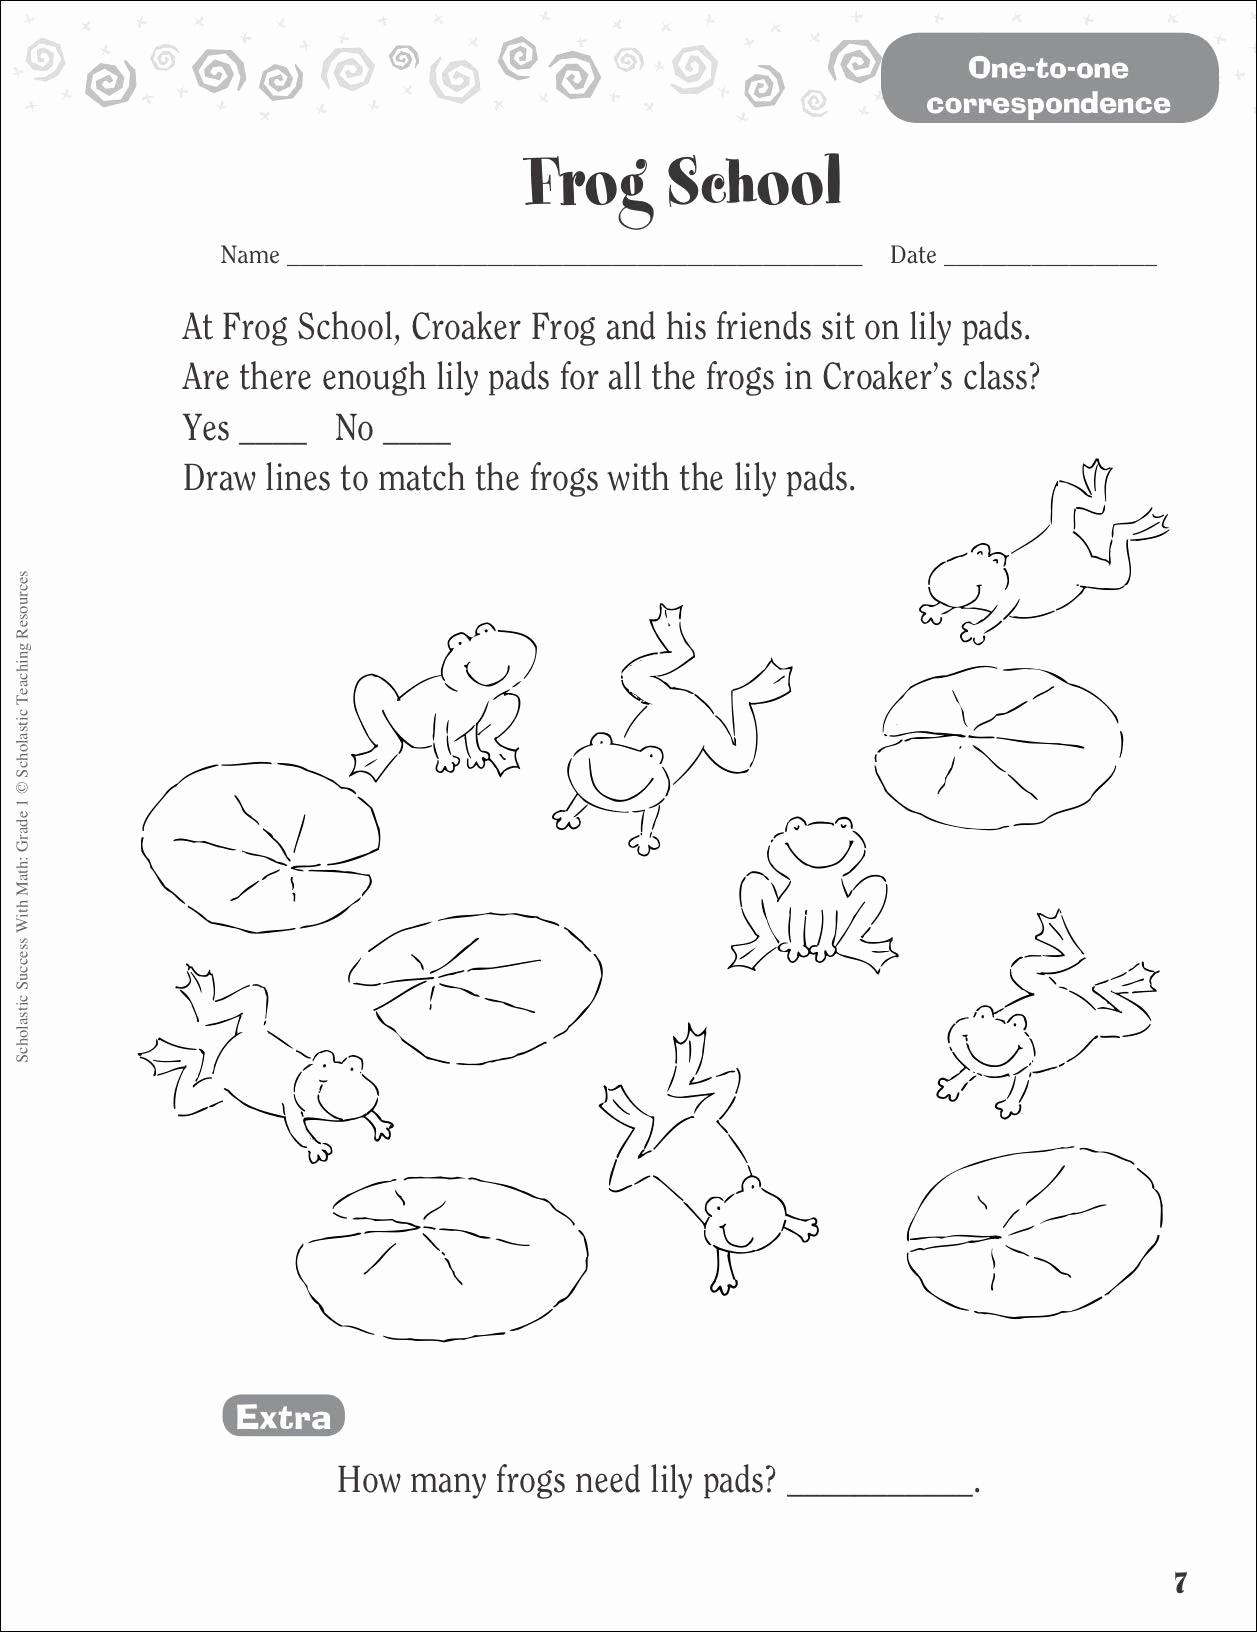 3rd Grade Main Idea Worksheets Inspirational 20 Main Idea Worksheet 3rd Grade